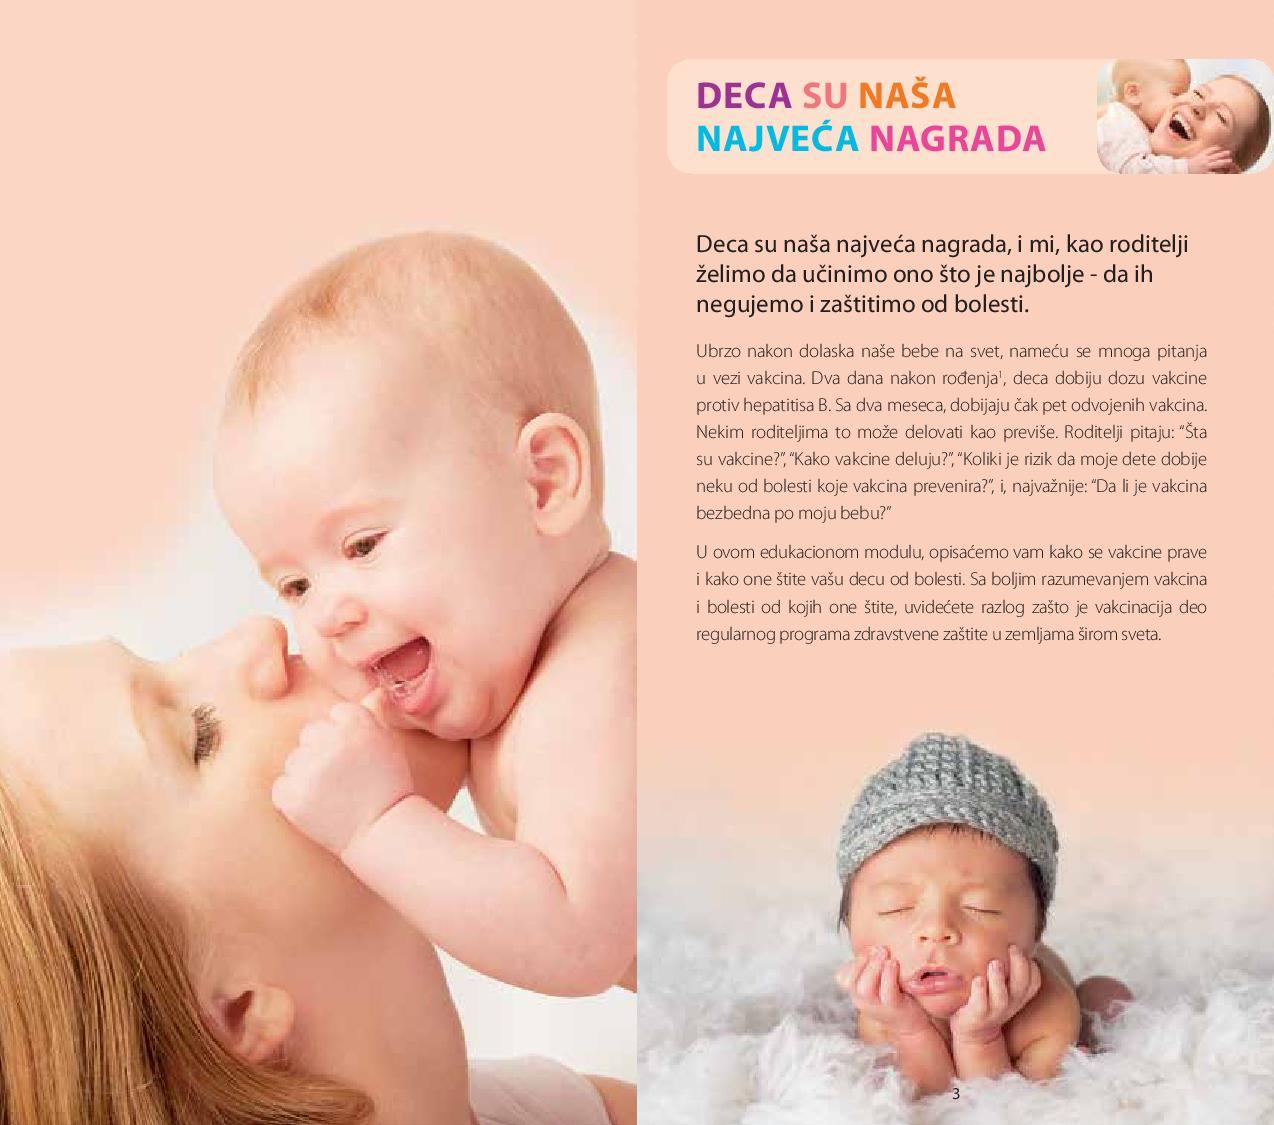 12332_BroshuraVACCINESbaby_Srubski_108x190_Idea01-01b bez vacc kartona.2-page-001